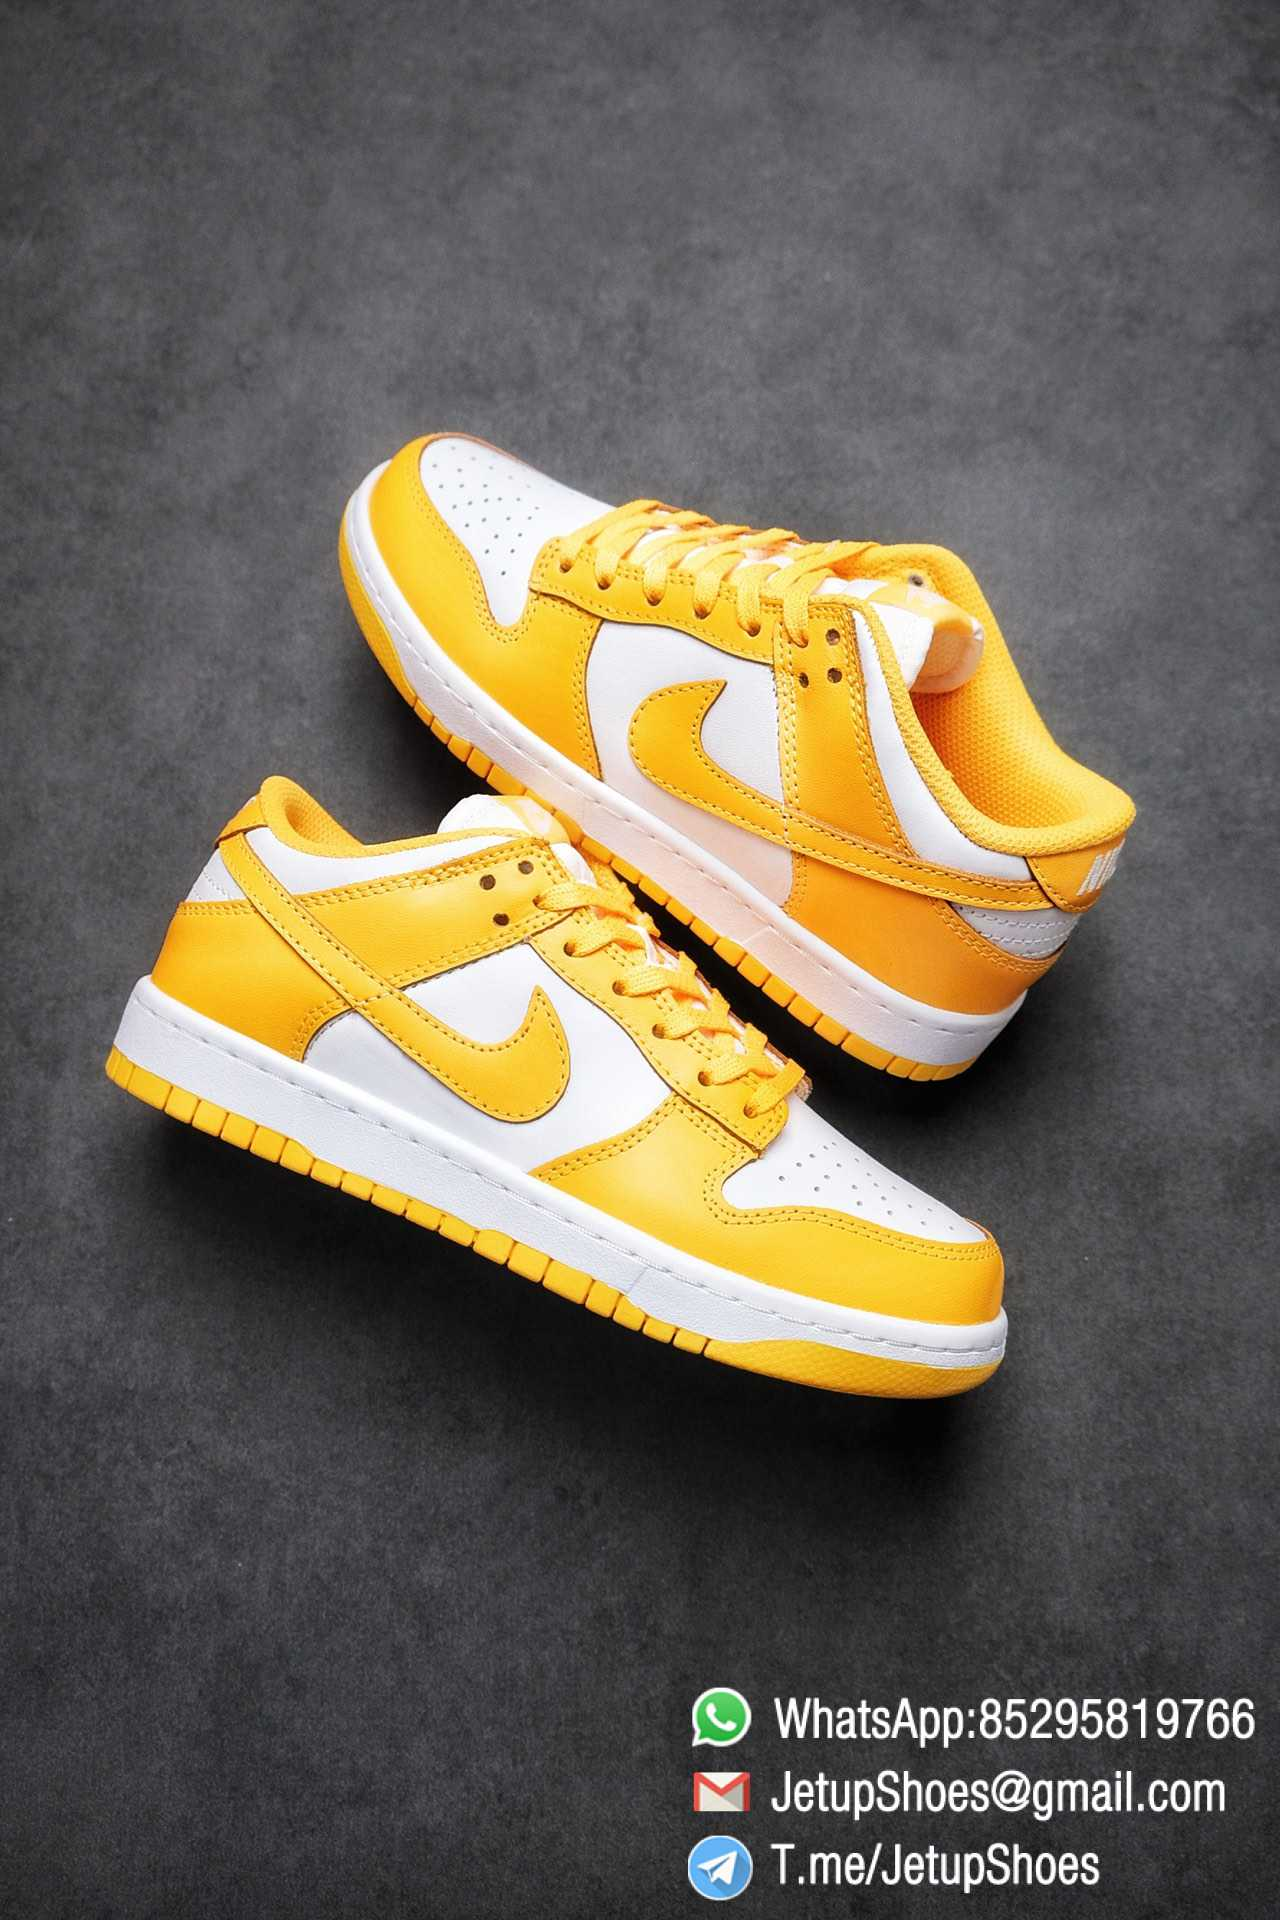 Top Quality Clone Sneakers Replica Nike SB Dunk Low 'Laser Orange' DD1503-800 Best RepSneakers